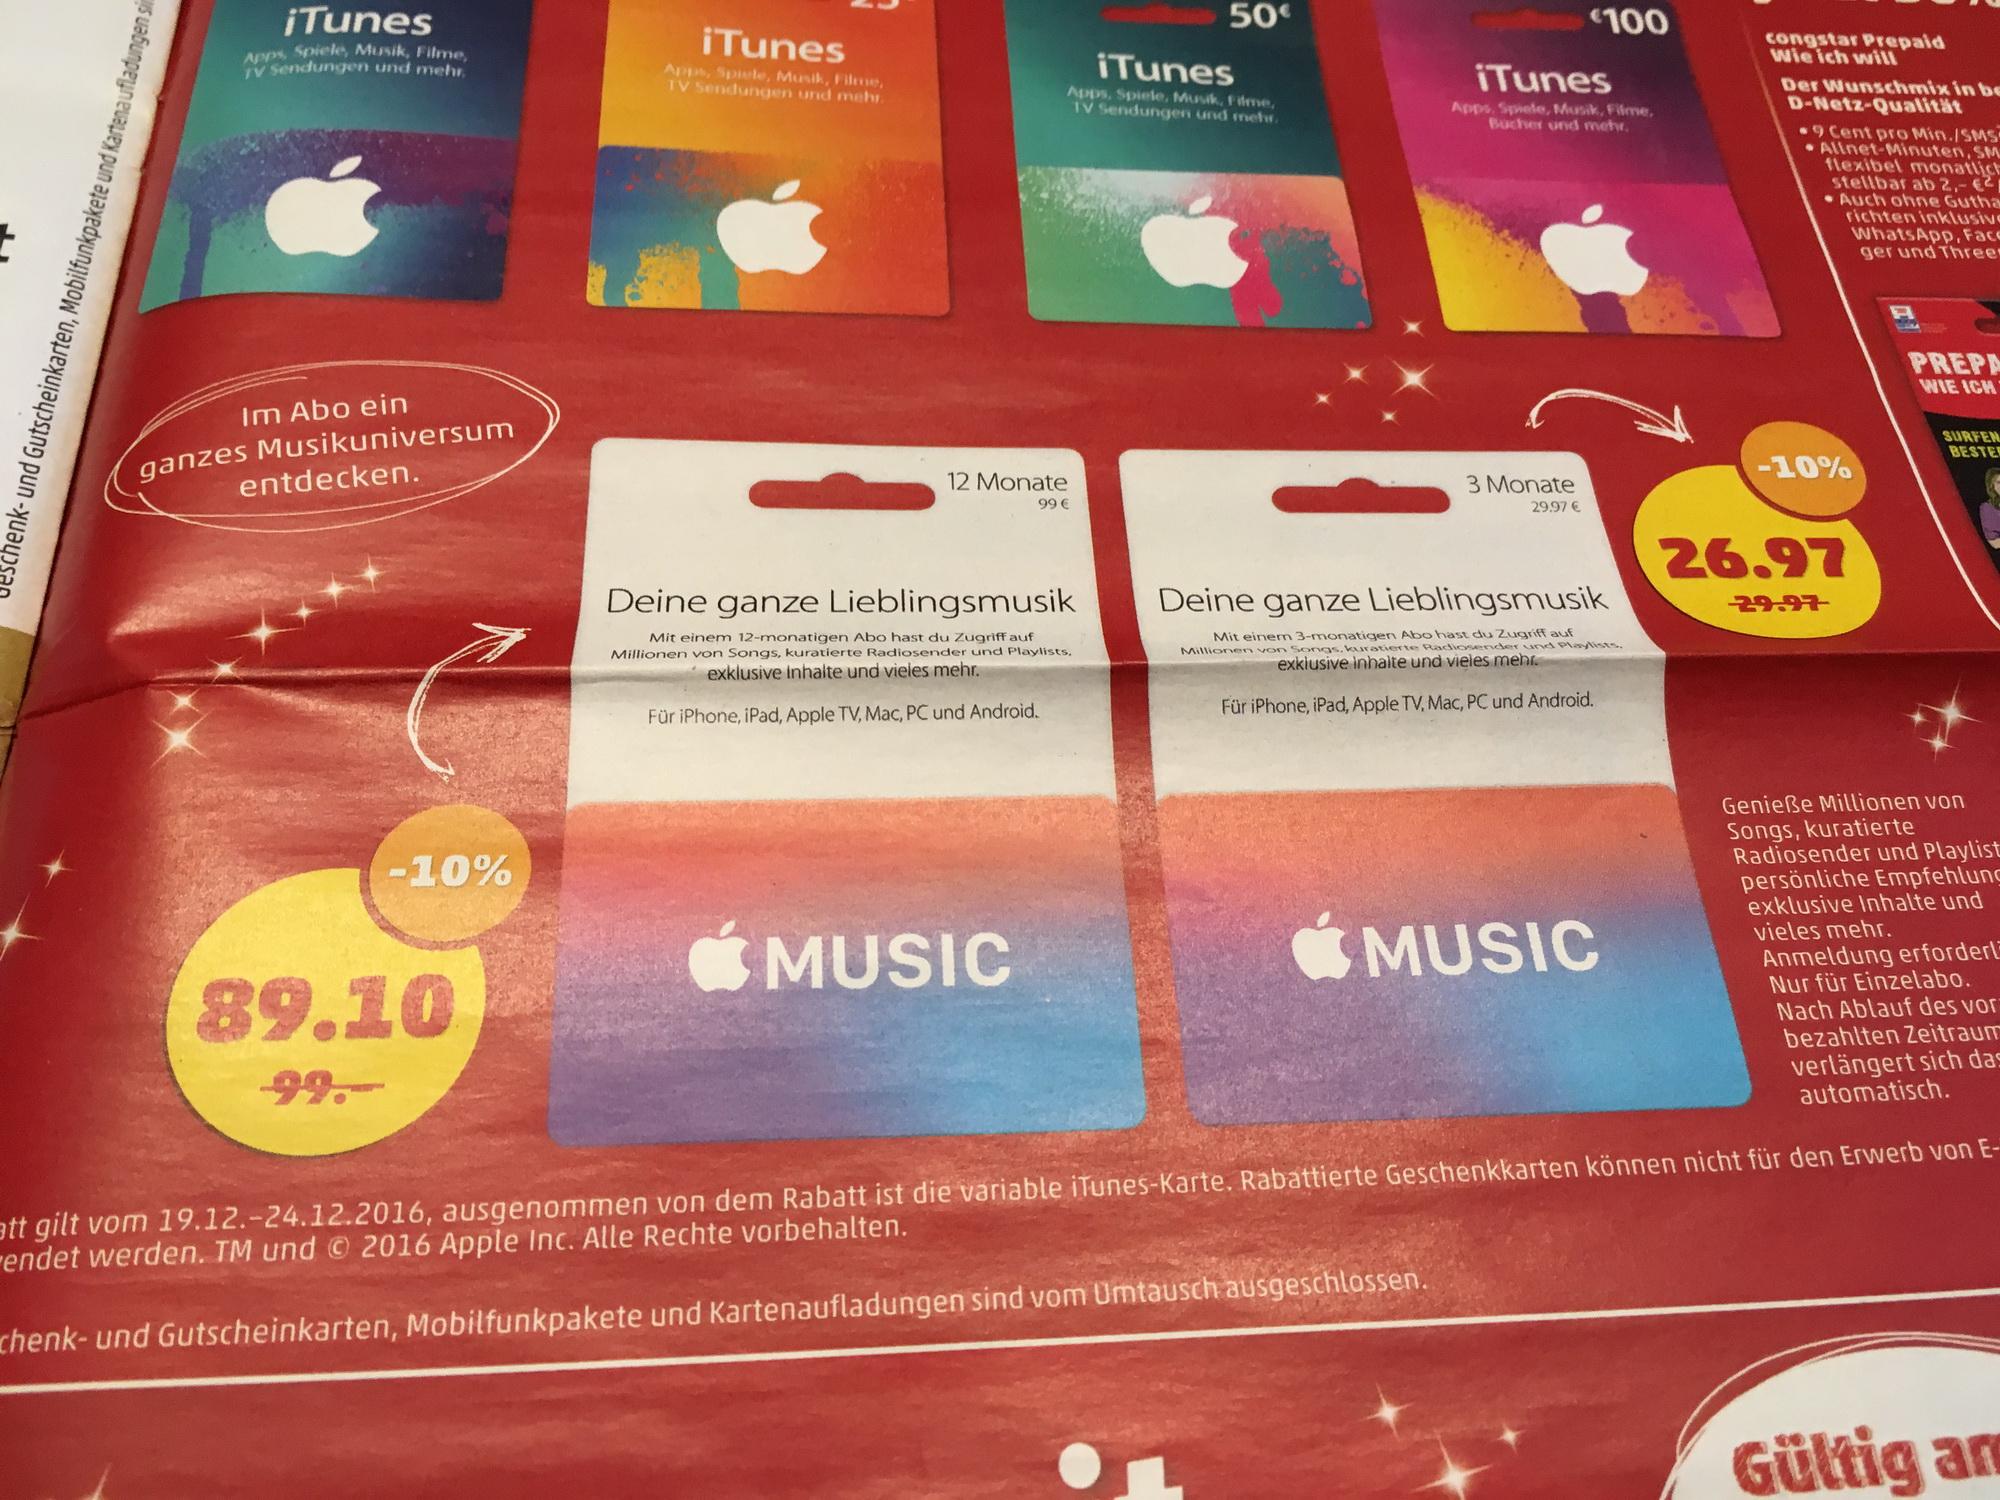 [Penny] Apple Music Prepaidcard - 3 Monate 26,97€ oder 12 Monate 89,10€